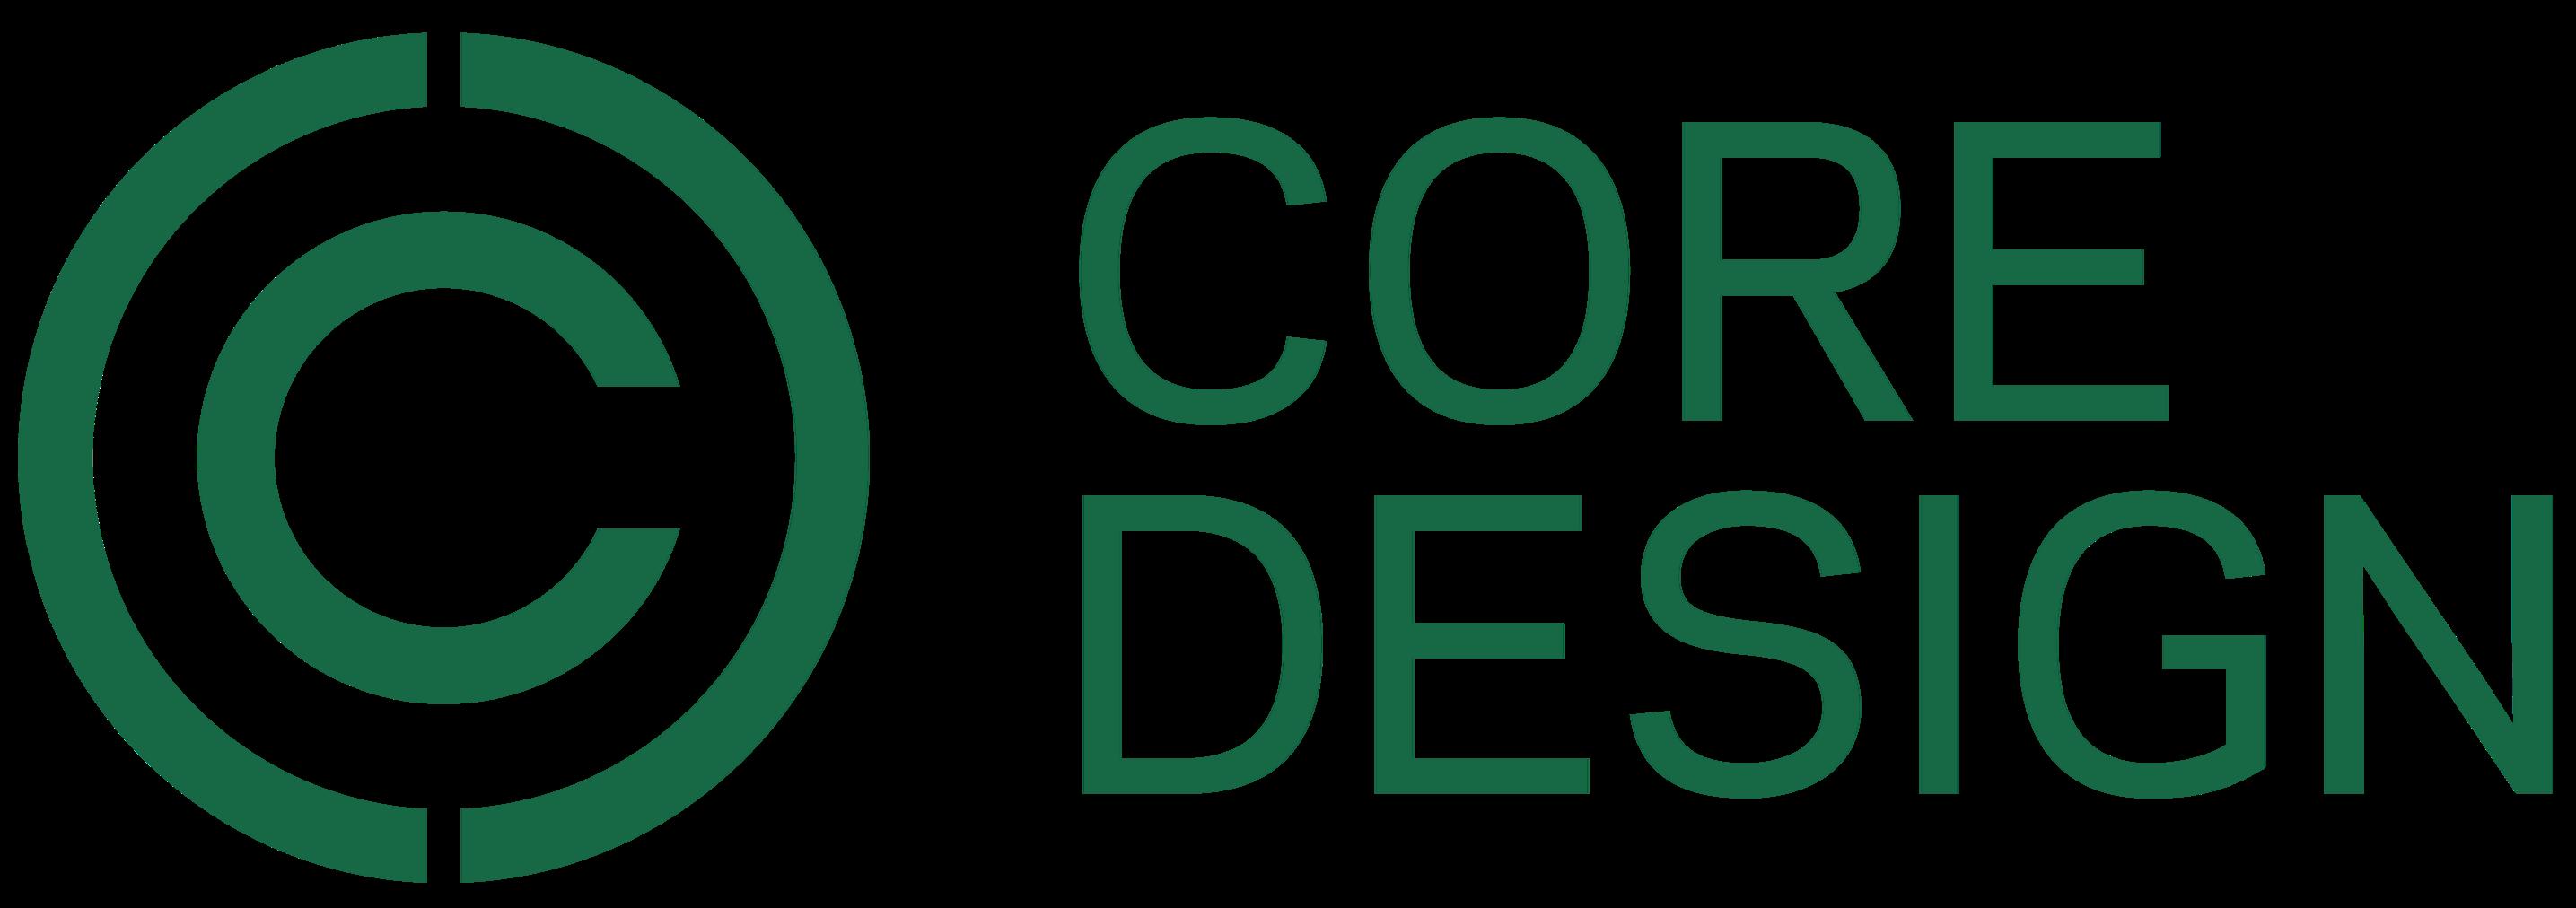 Coredesign